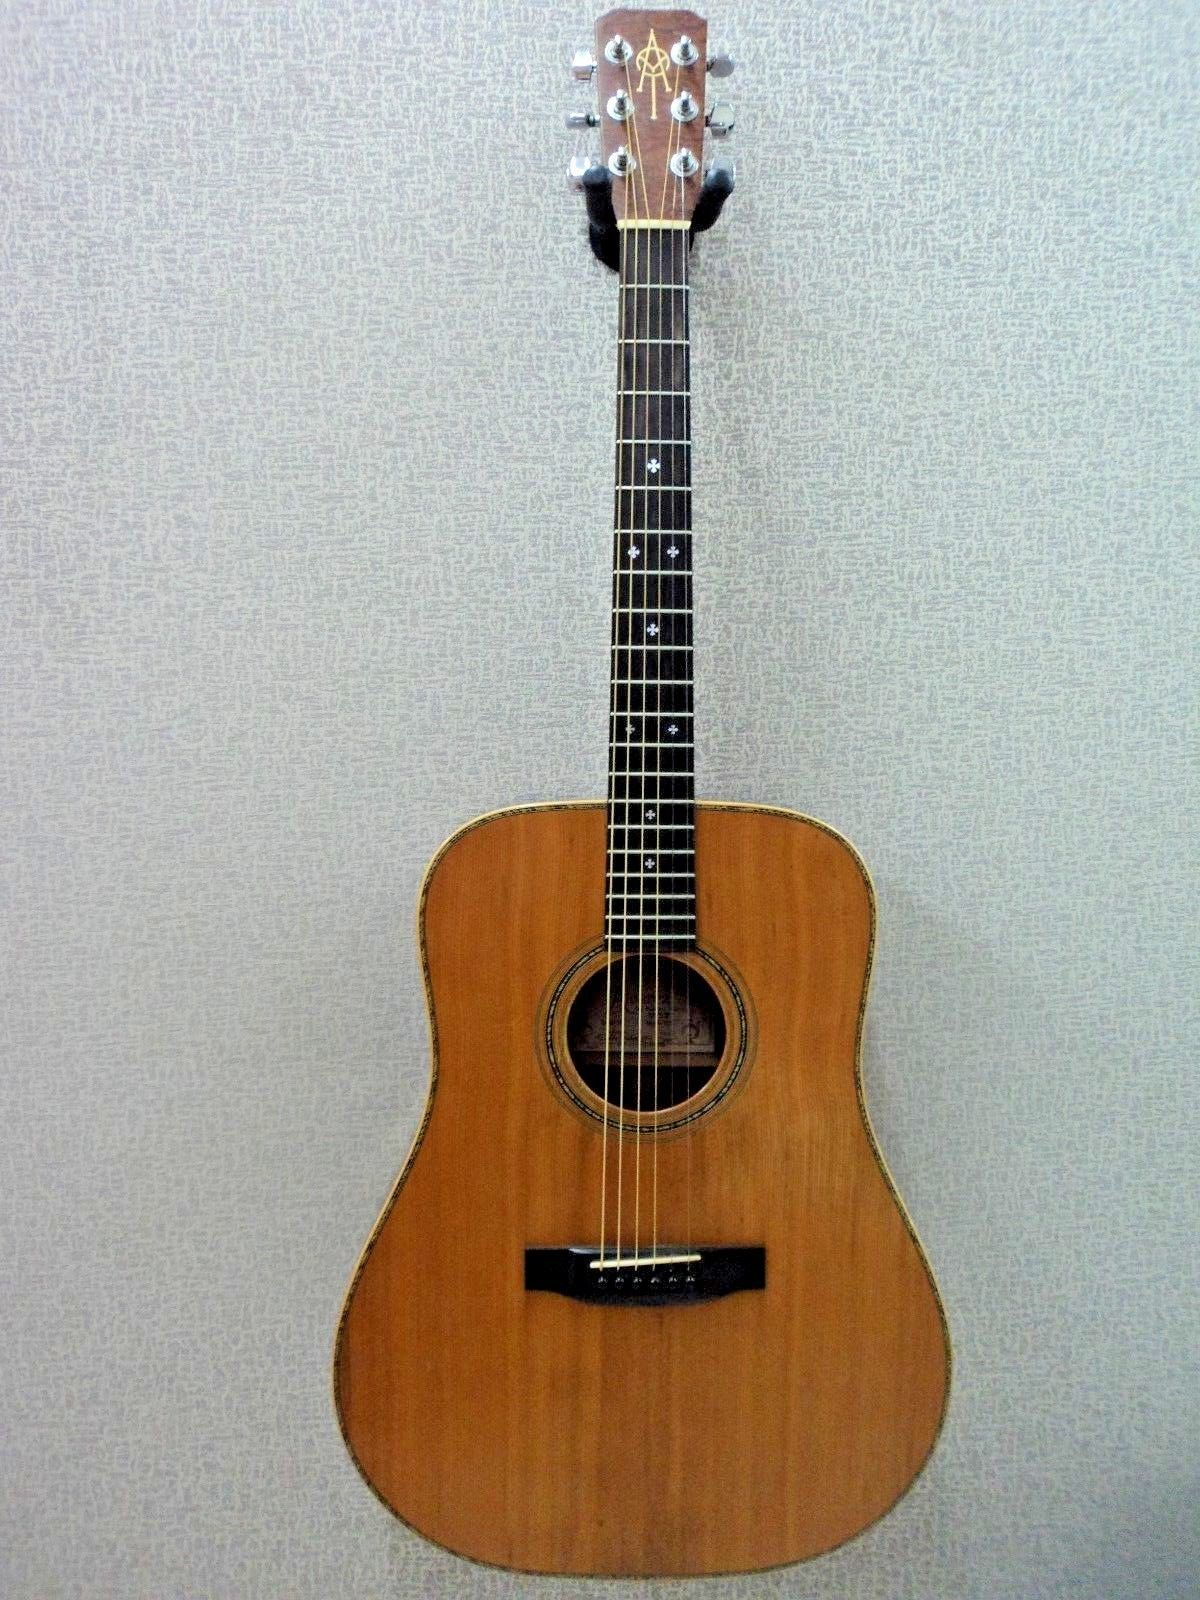 e4881676ef9 1981 Vintage Alvarez Yairi DY53 Hand Made Acoustic Guitar with Hardshell  case | eBay